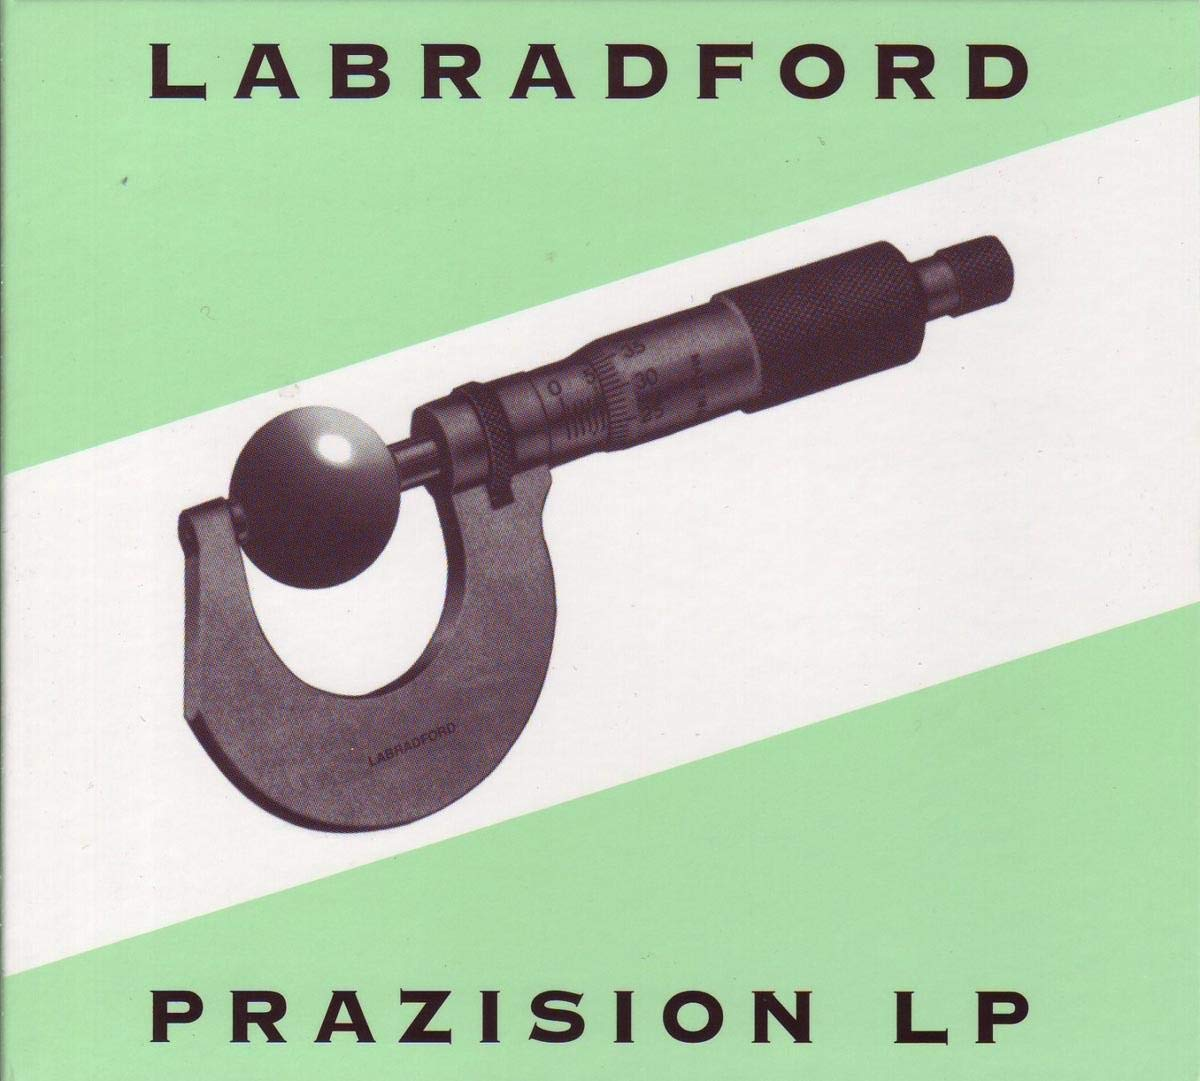 cd: Prazision LP labradford